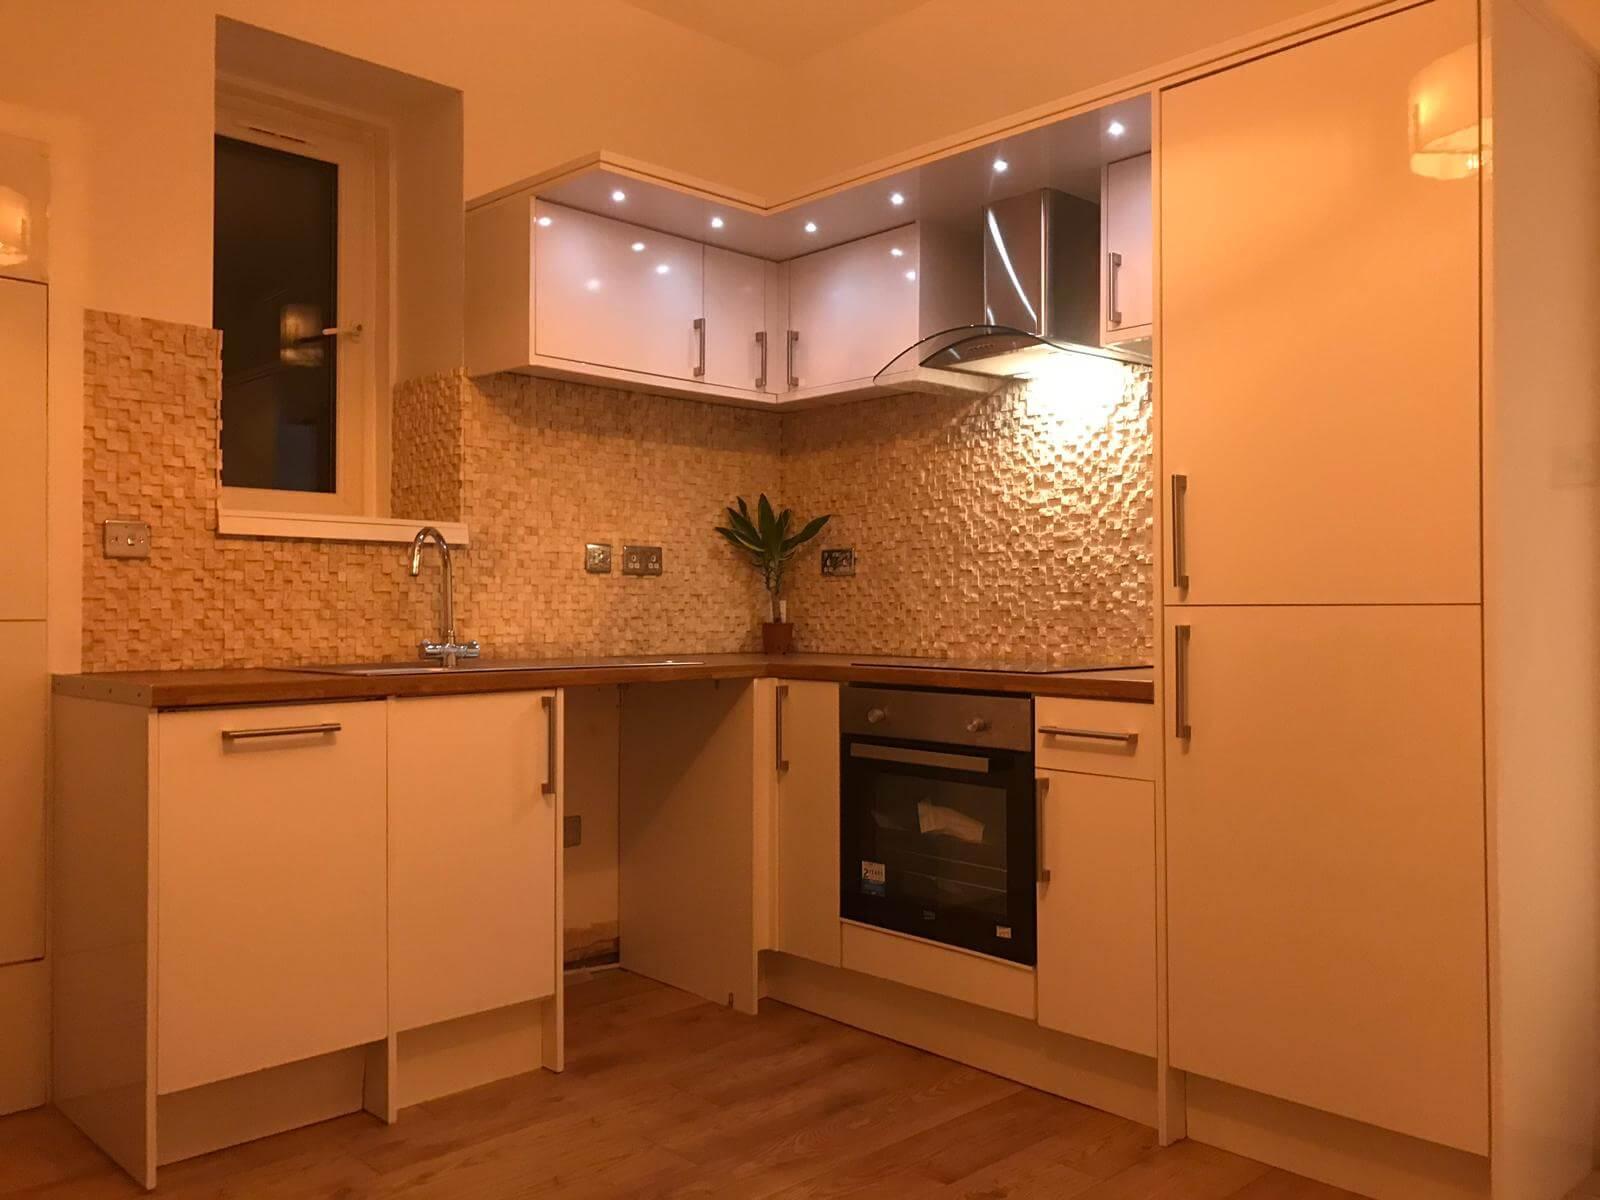 kitchen renovation by company FIX LTD from Glasgow